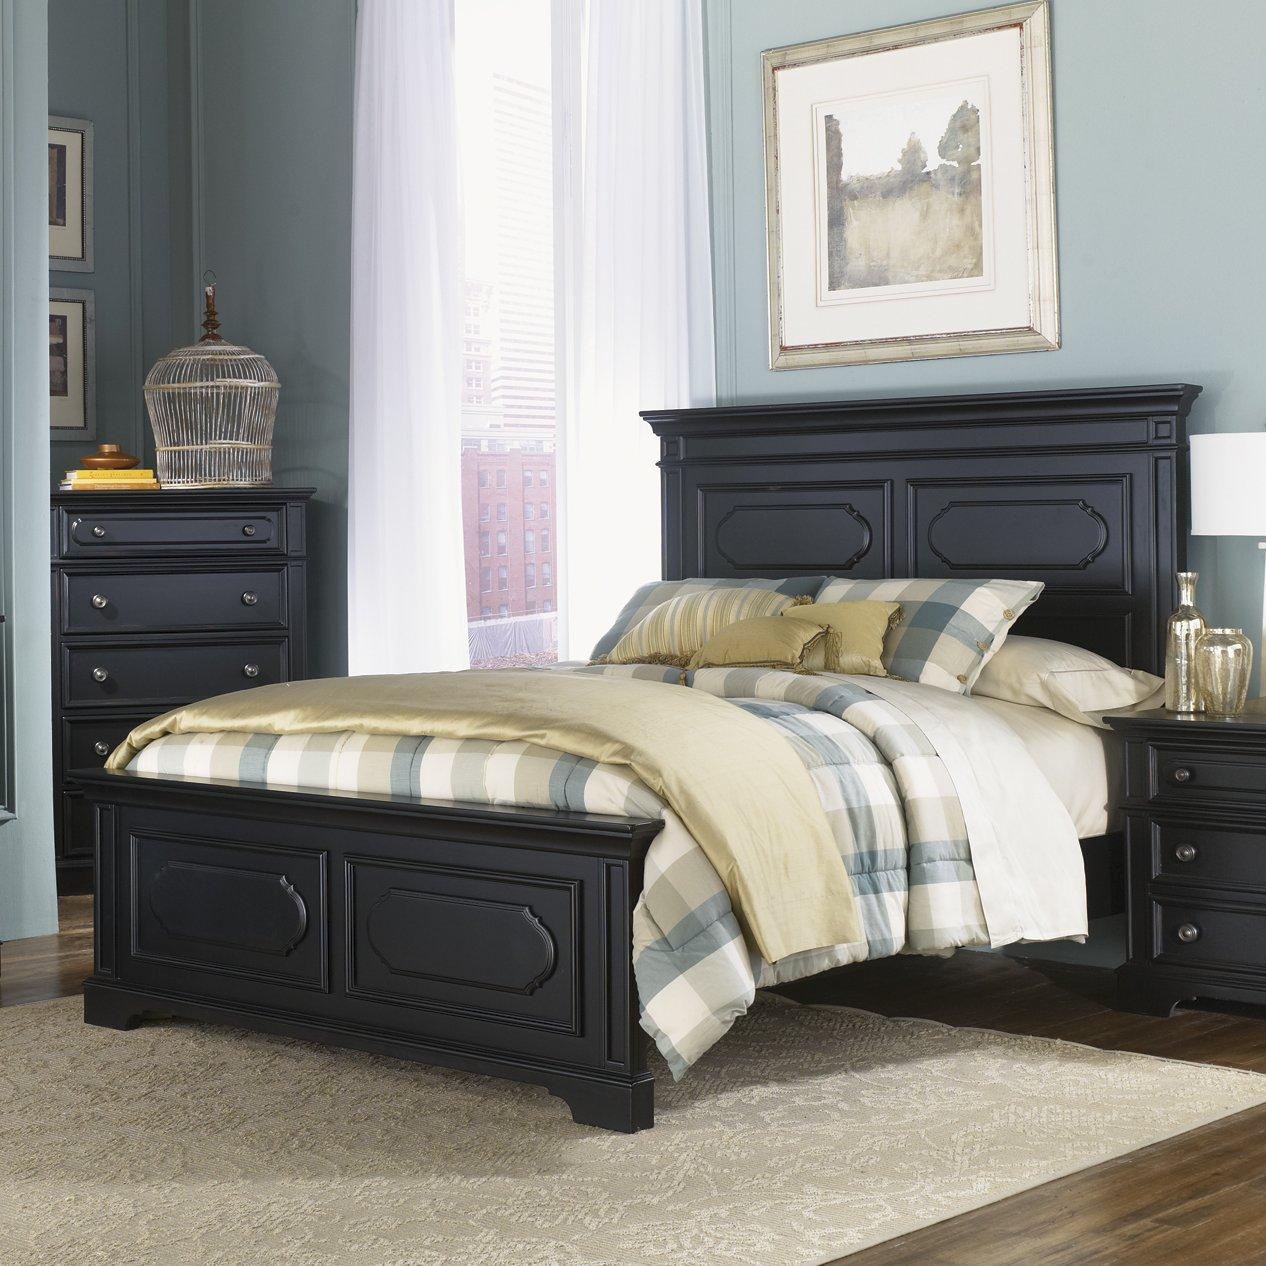 black liberty bedroom furniture photo - 3